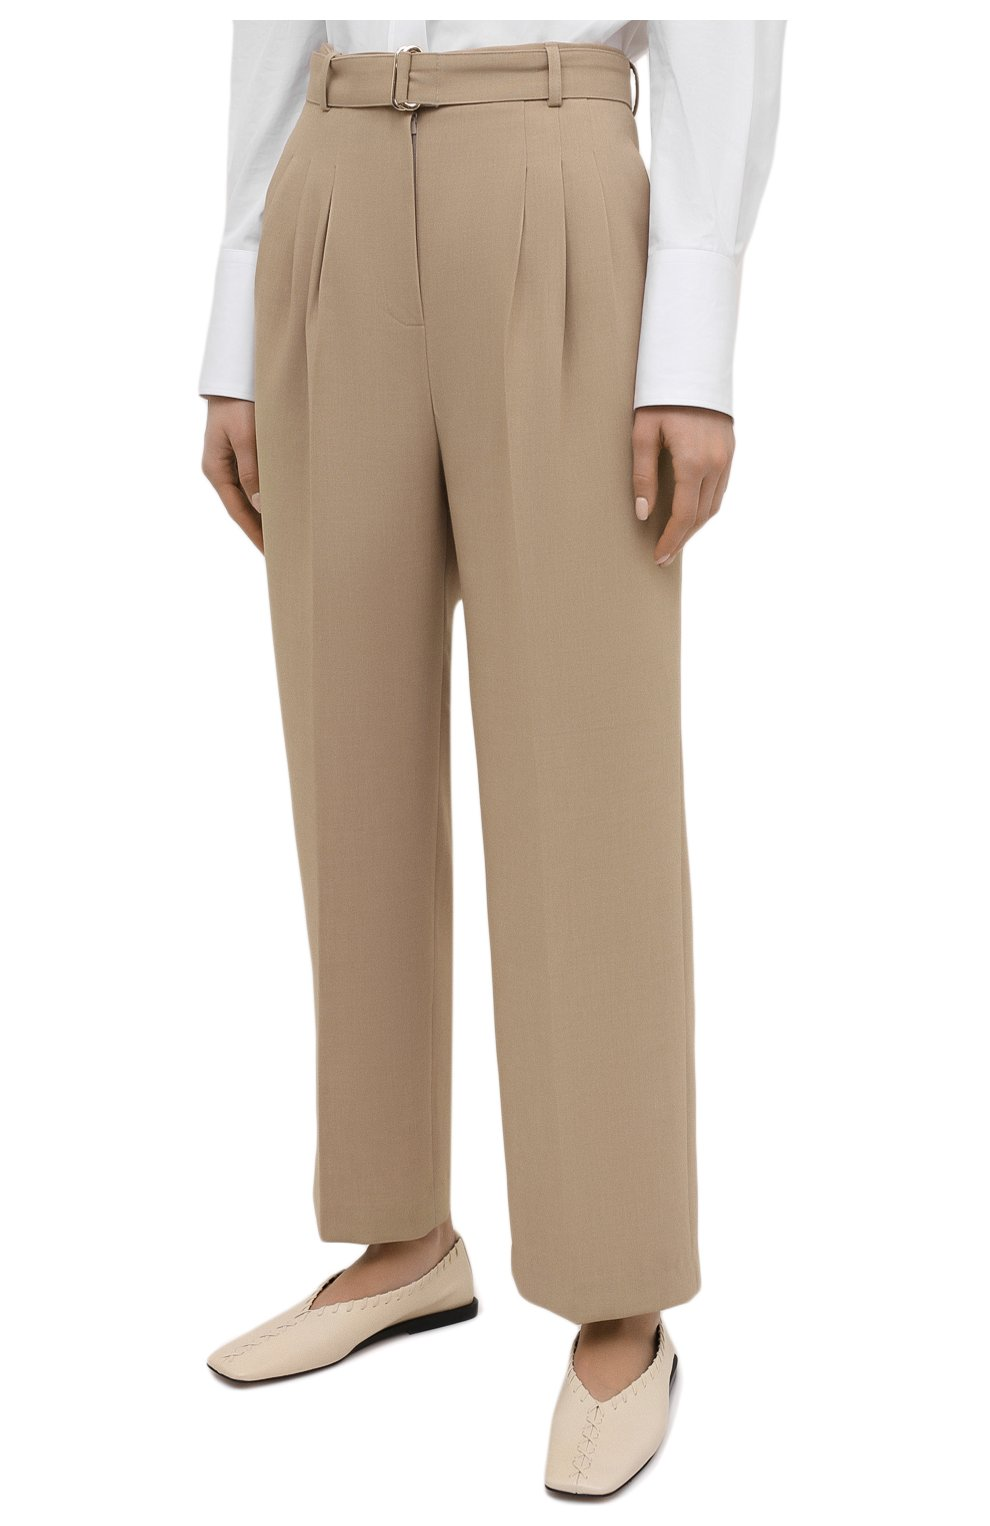 Женские брюки THE FRANKIE SHOP бежевого цвета, арт. PA BSP KR 09/WHEAT | Фото 3